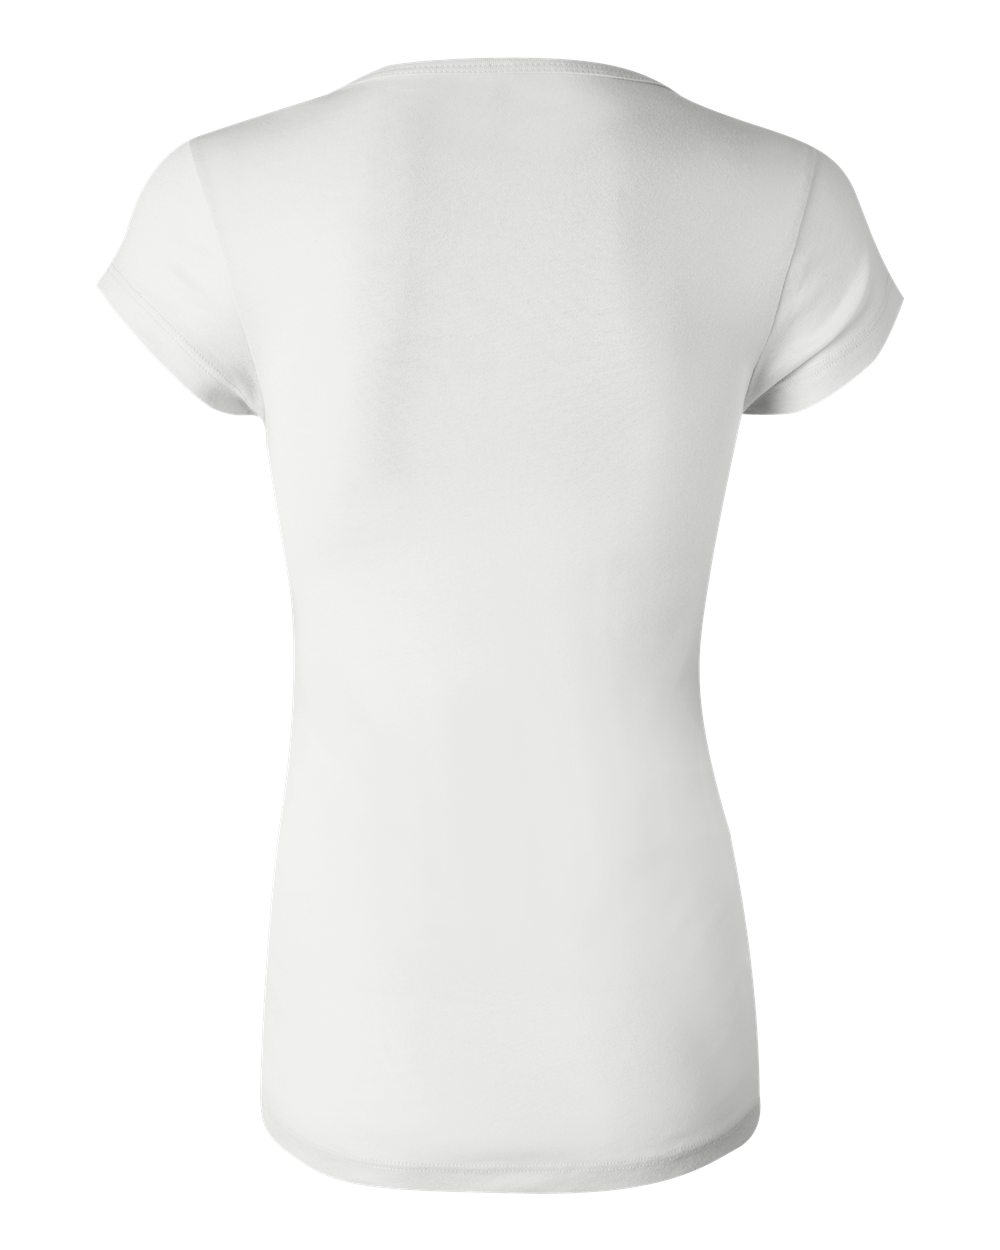 Bella-Canvas-Women-039-s-Sheer-Mini-Rib-Short-Sleeve-Scoop-Neck-T-Shirt-B8703-S-2XL thumbnail 4